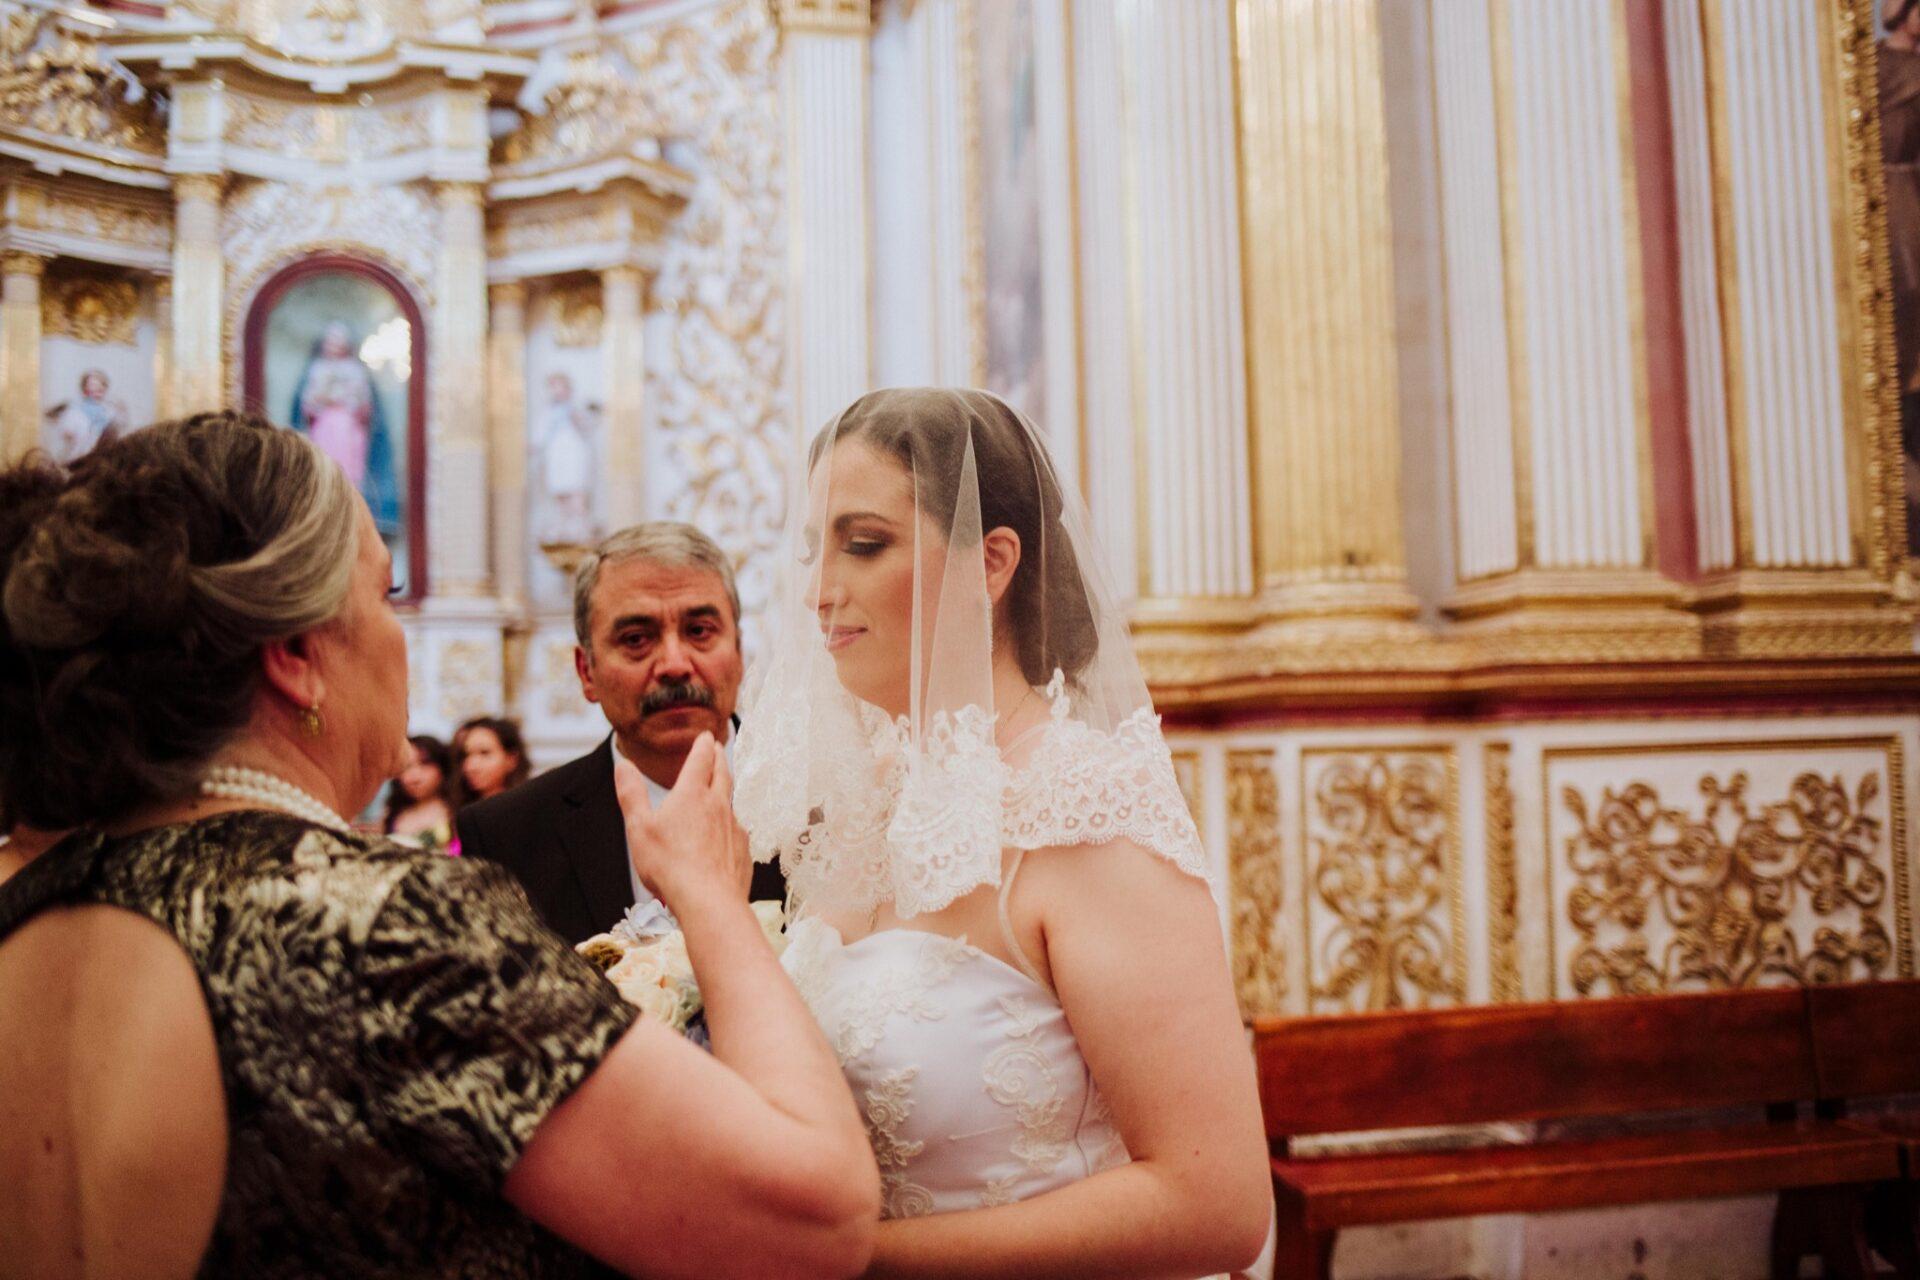 javier_noriega_fotografo_bodas_centro_platero_zacatecas_wedding_photographer7